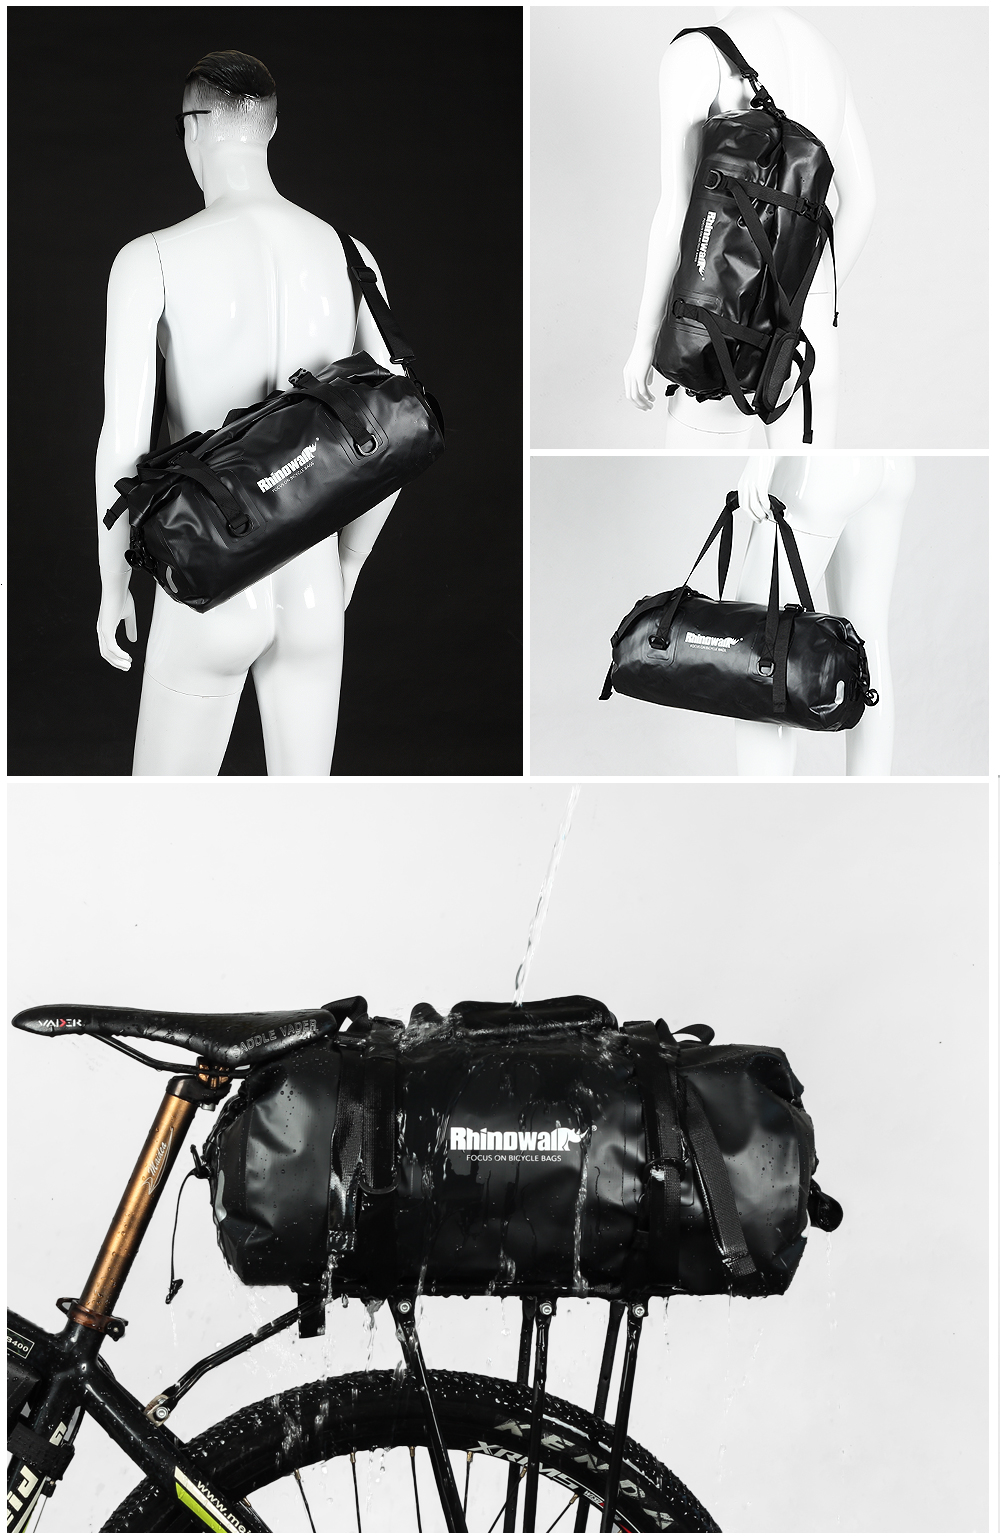 Rhinowalk Bicycle Luggage Bags 20L Full Waterproof for Road Bike Rear Rack Trunk Cycling Saddle Storage Pannier Multi Travel Bag (3)